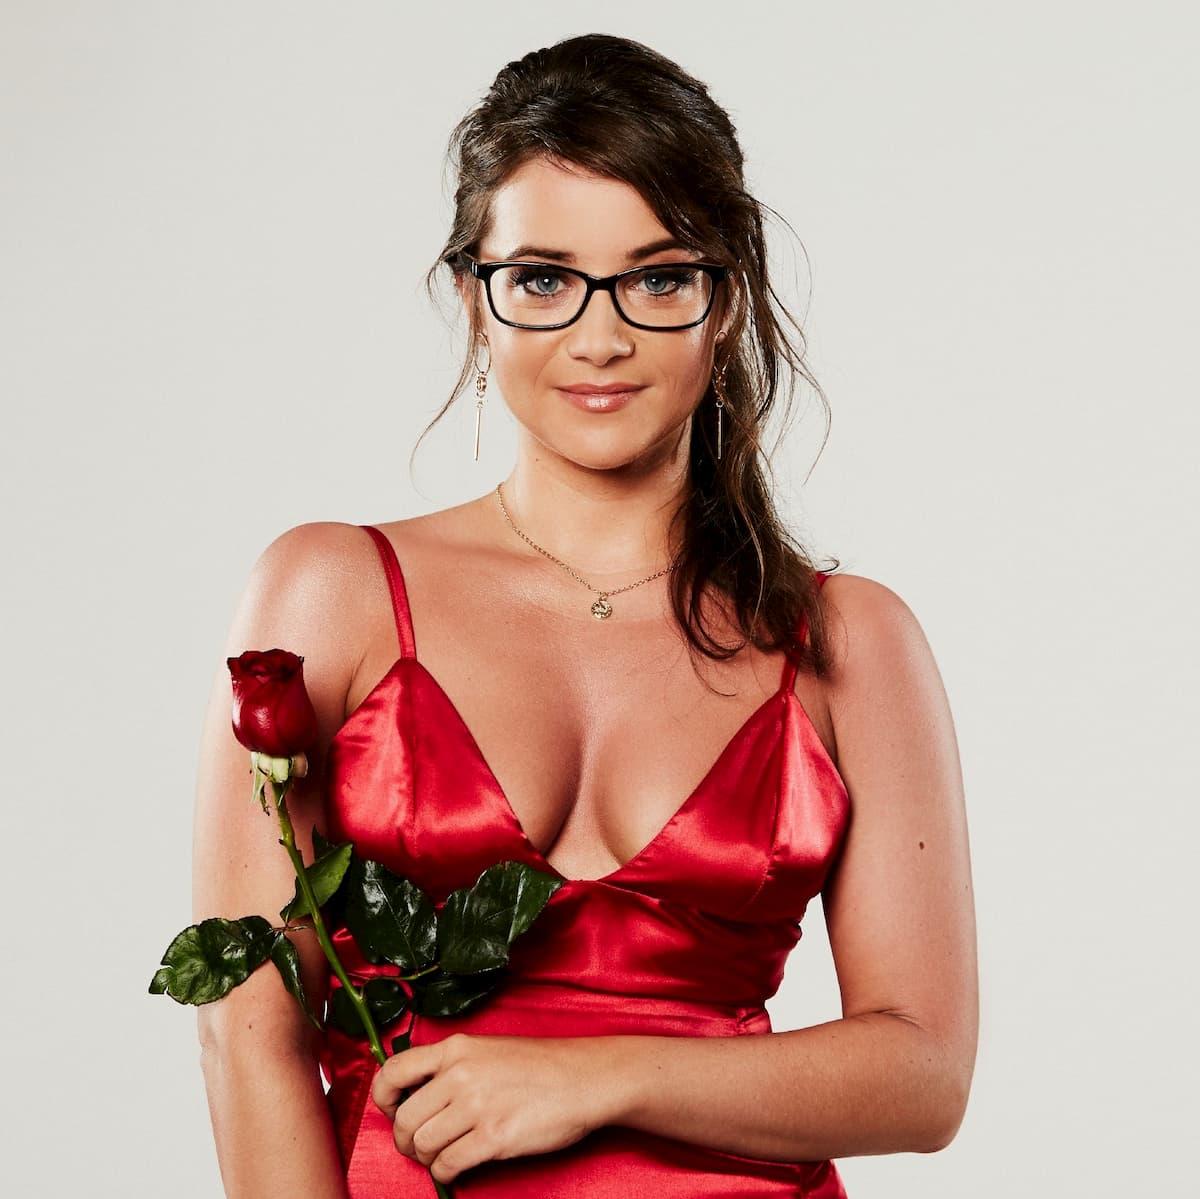 Laureen - Kandidatin beim Bachelor 2020